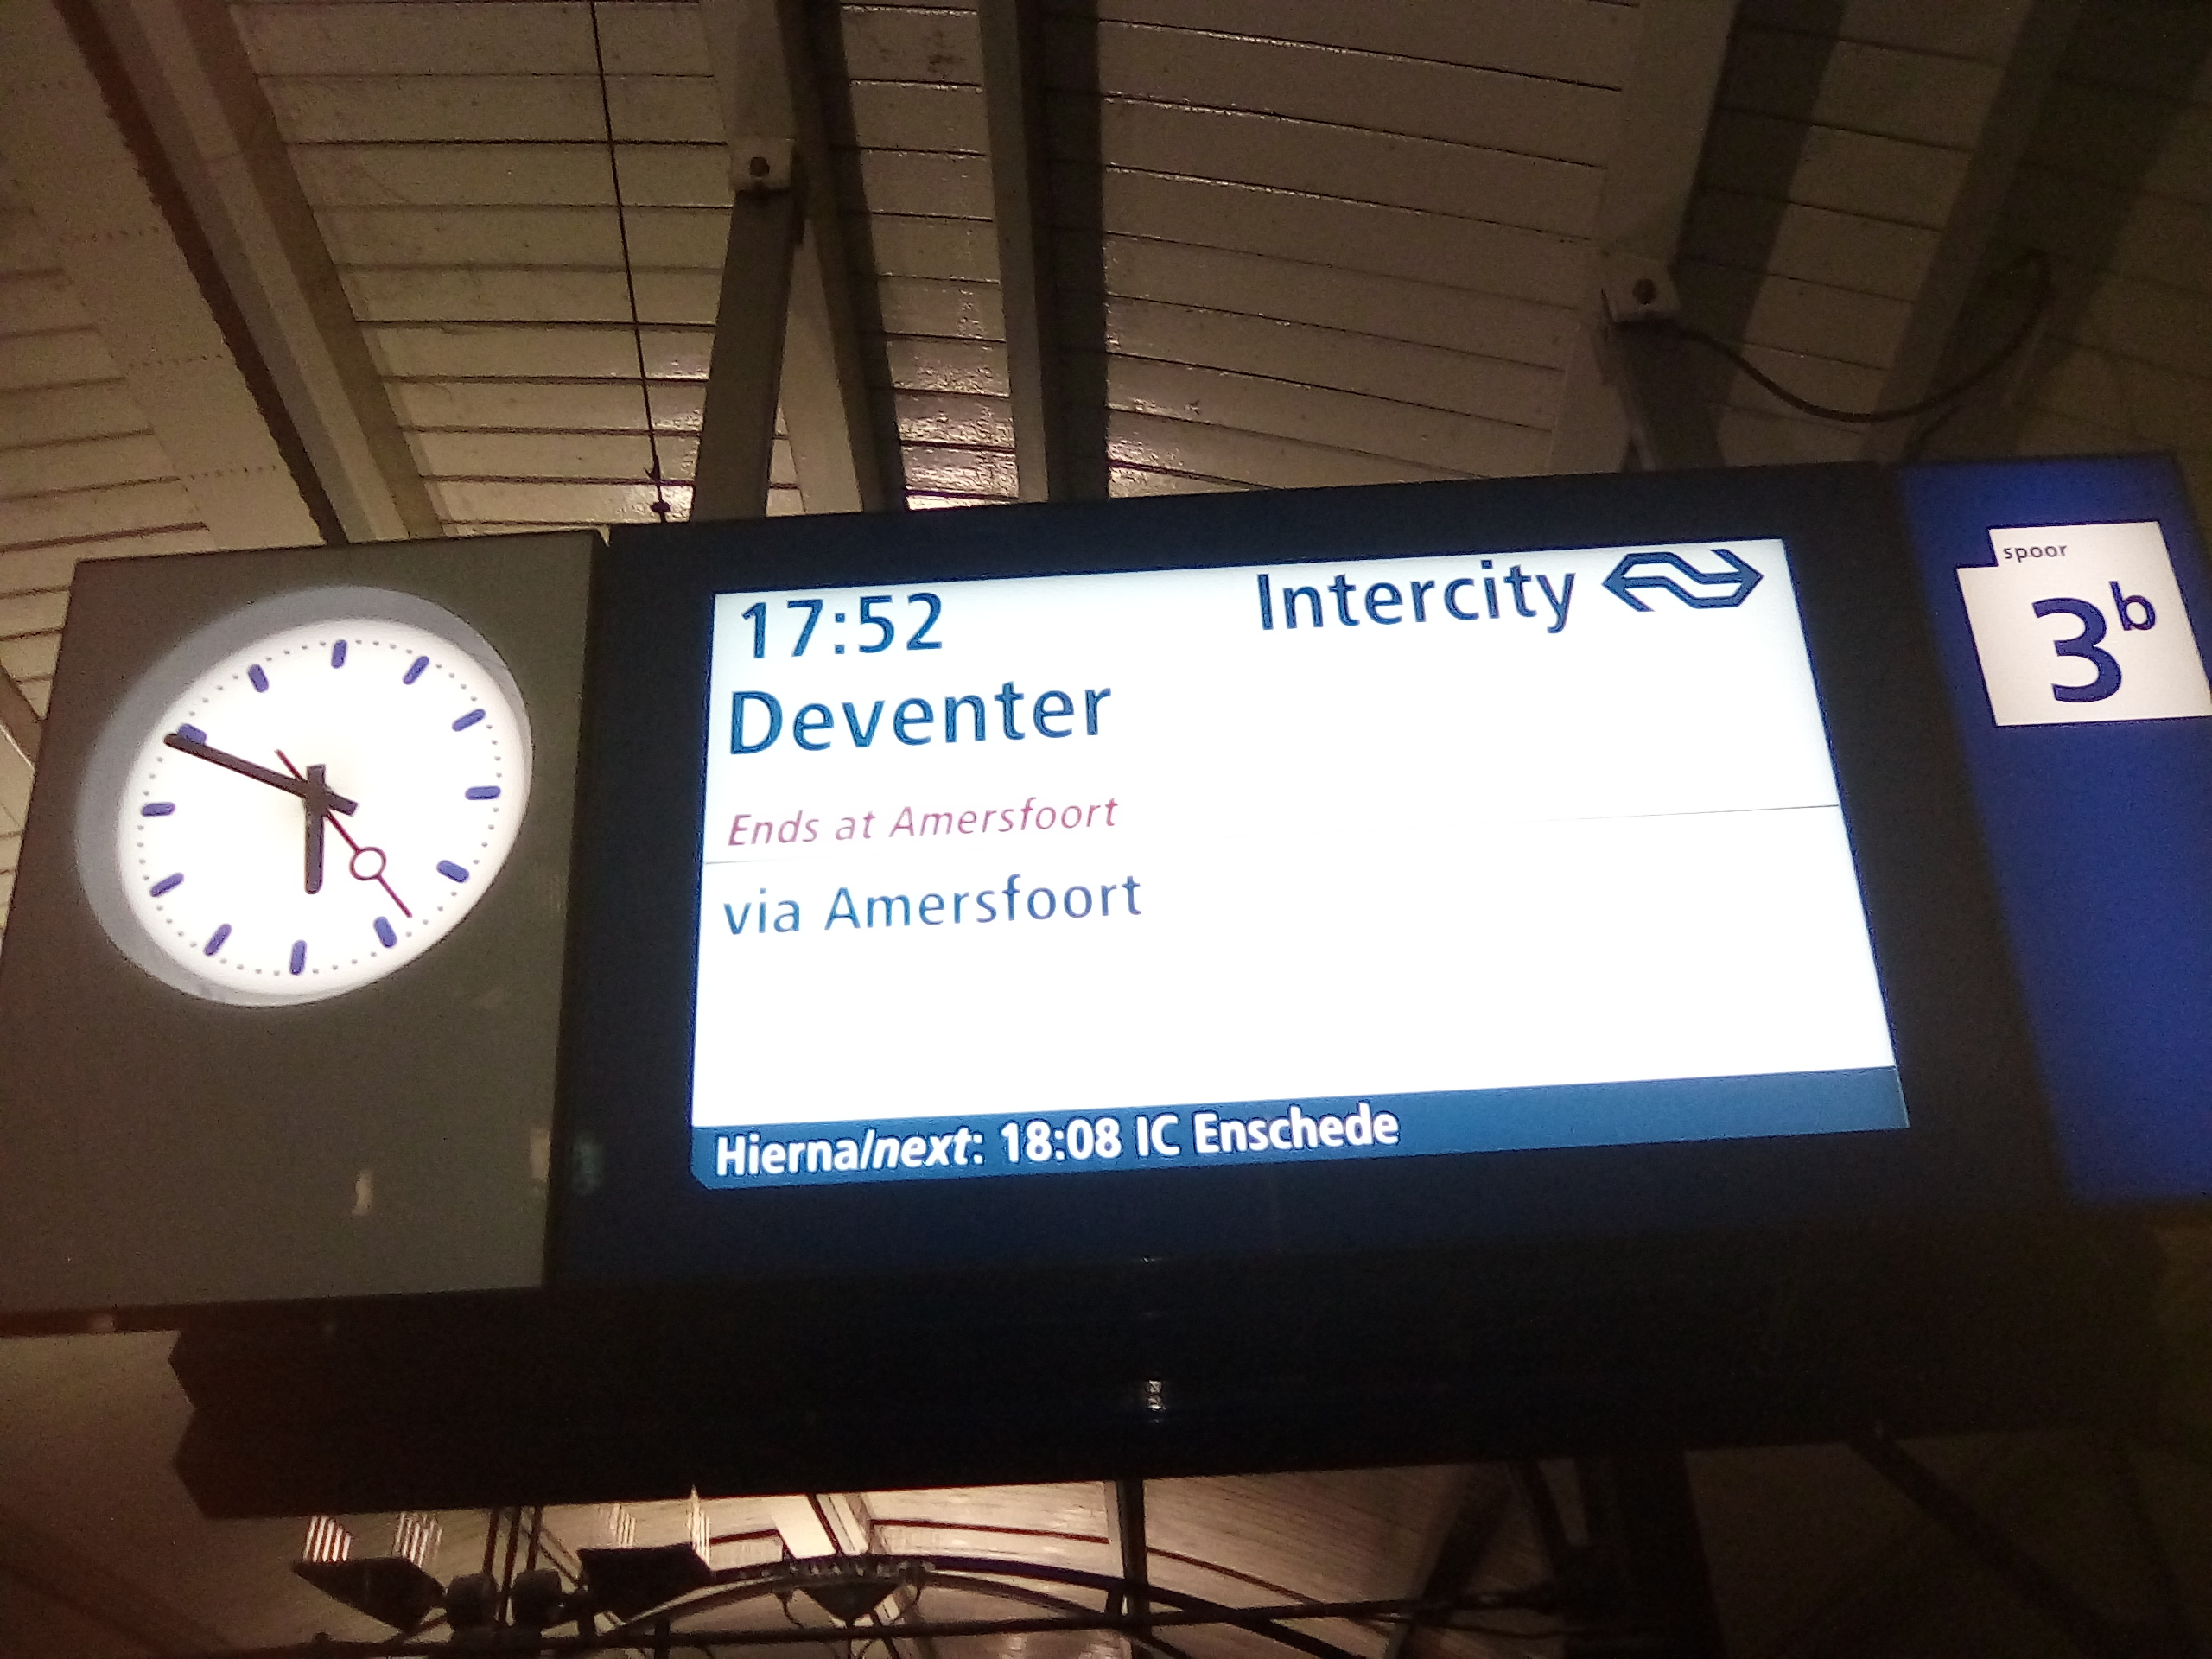 Passenger information system - Wikipedia